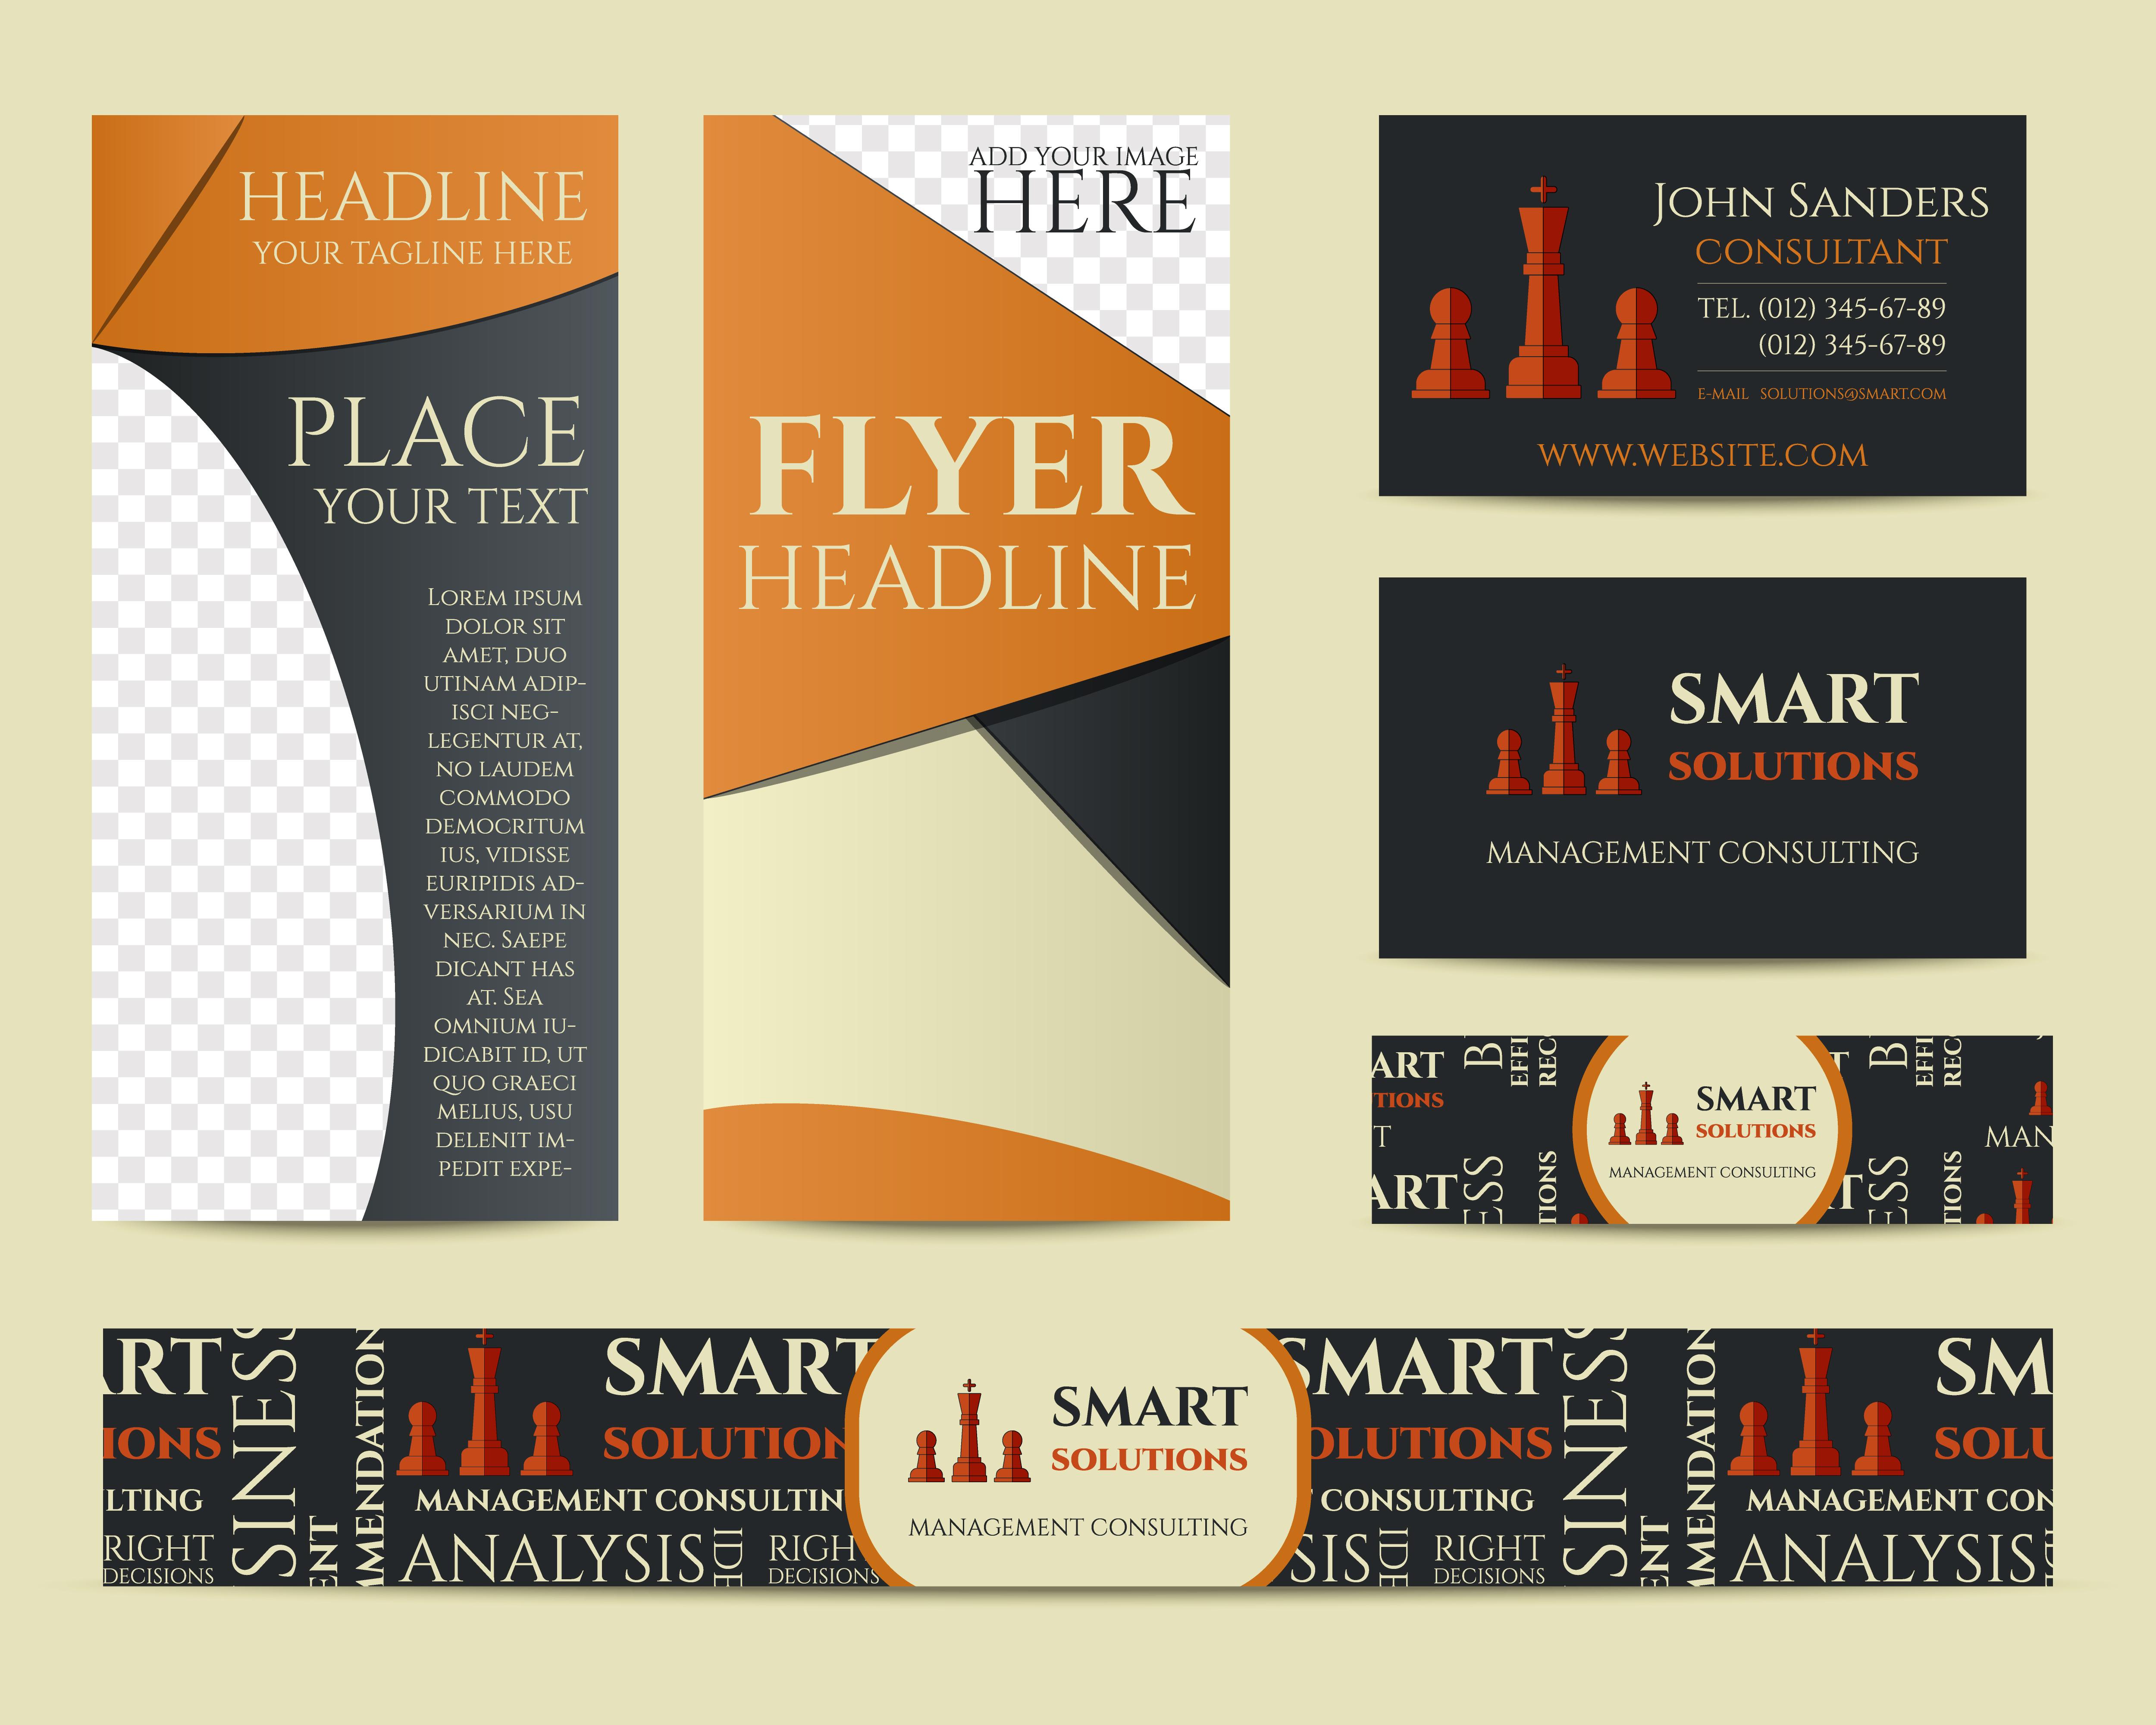 Technology Management Image: Smart Solutions Business Branding Identity Set. Flyer